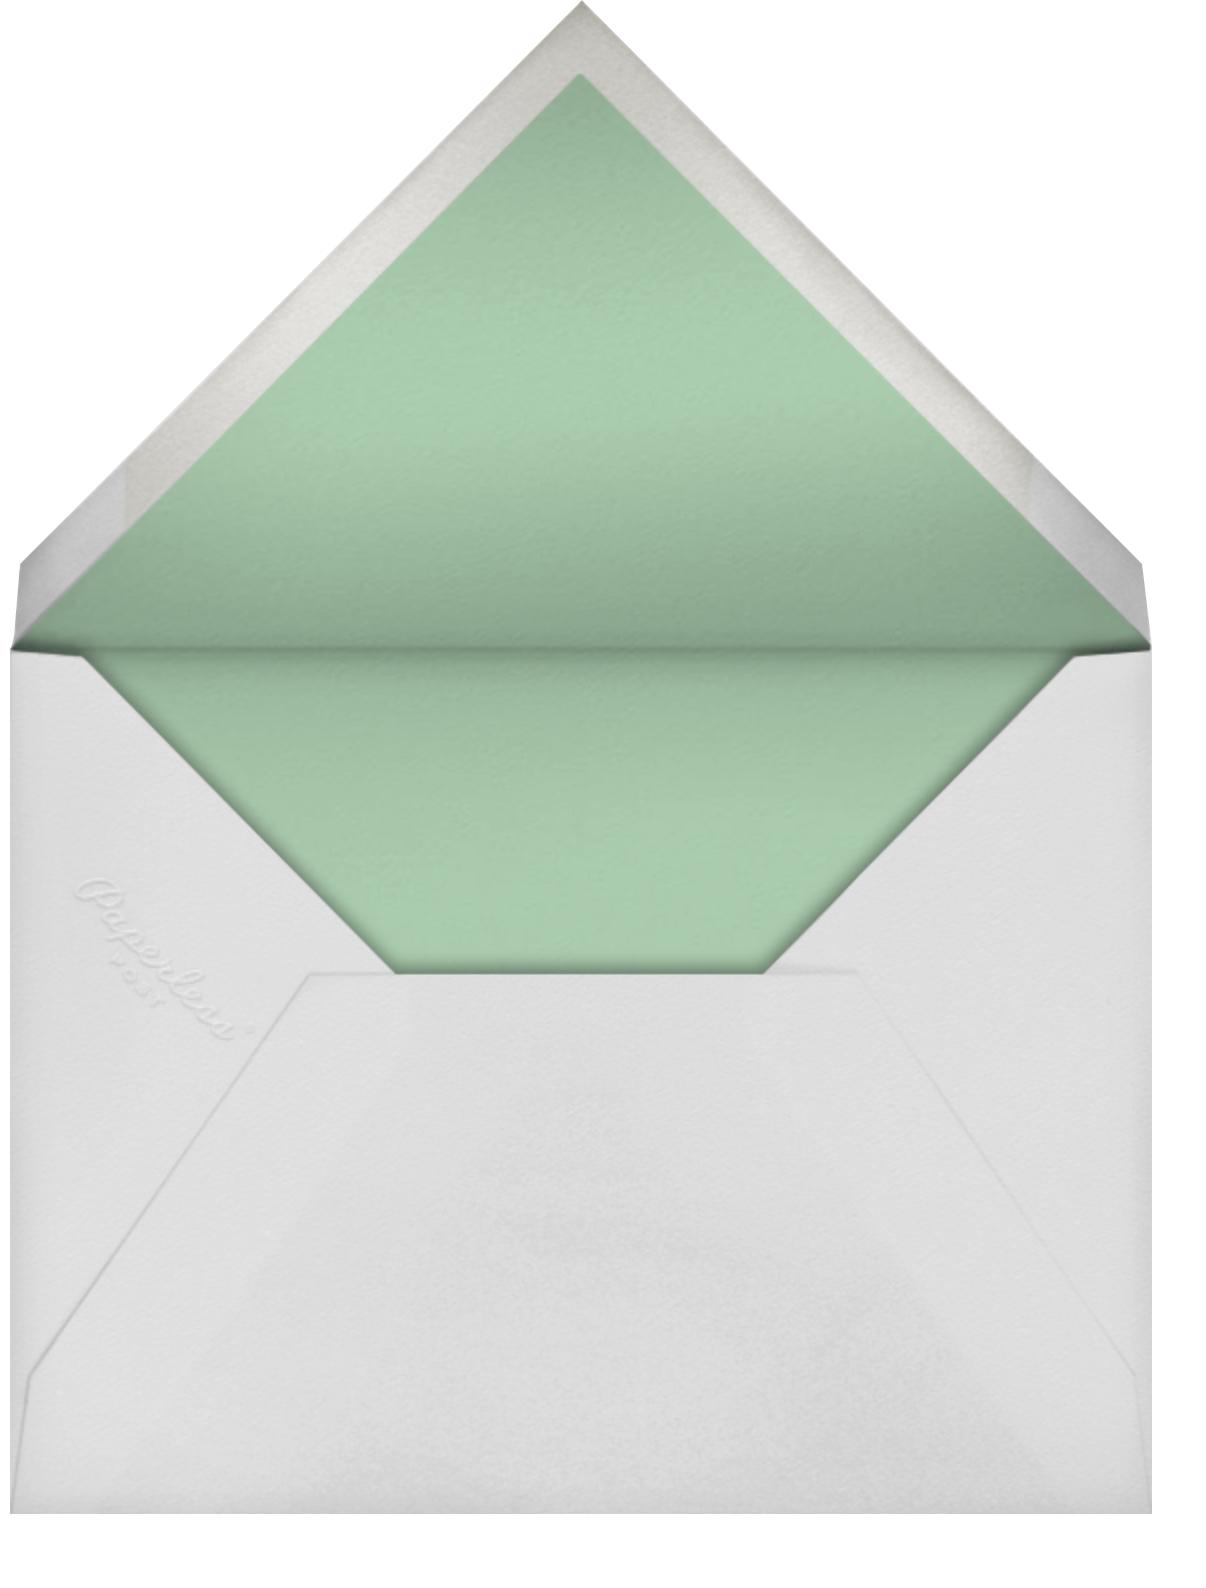 Falling Flowers - Mint - kate spade new york - Baby shower - envelope back